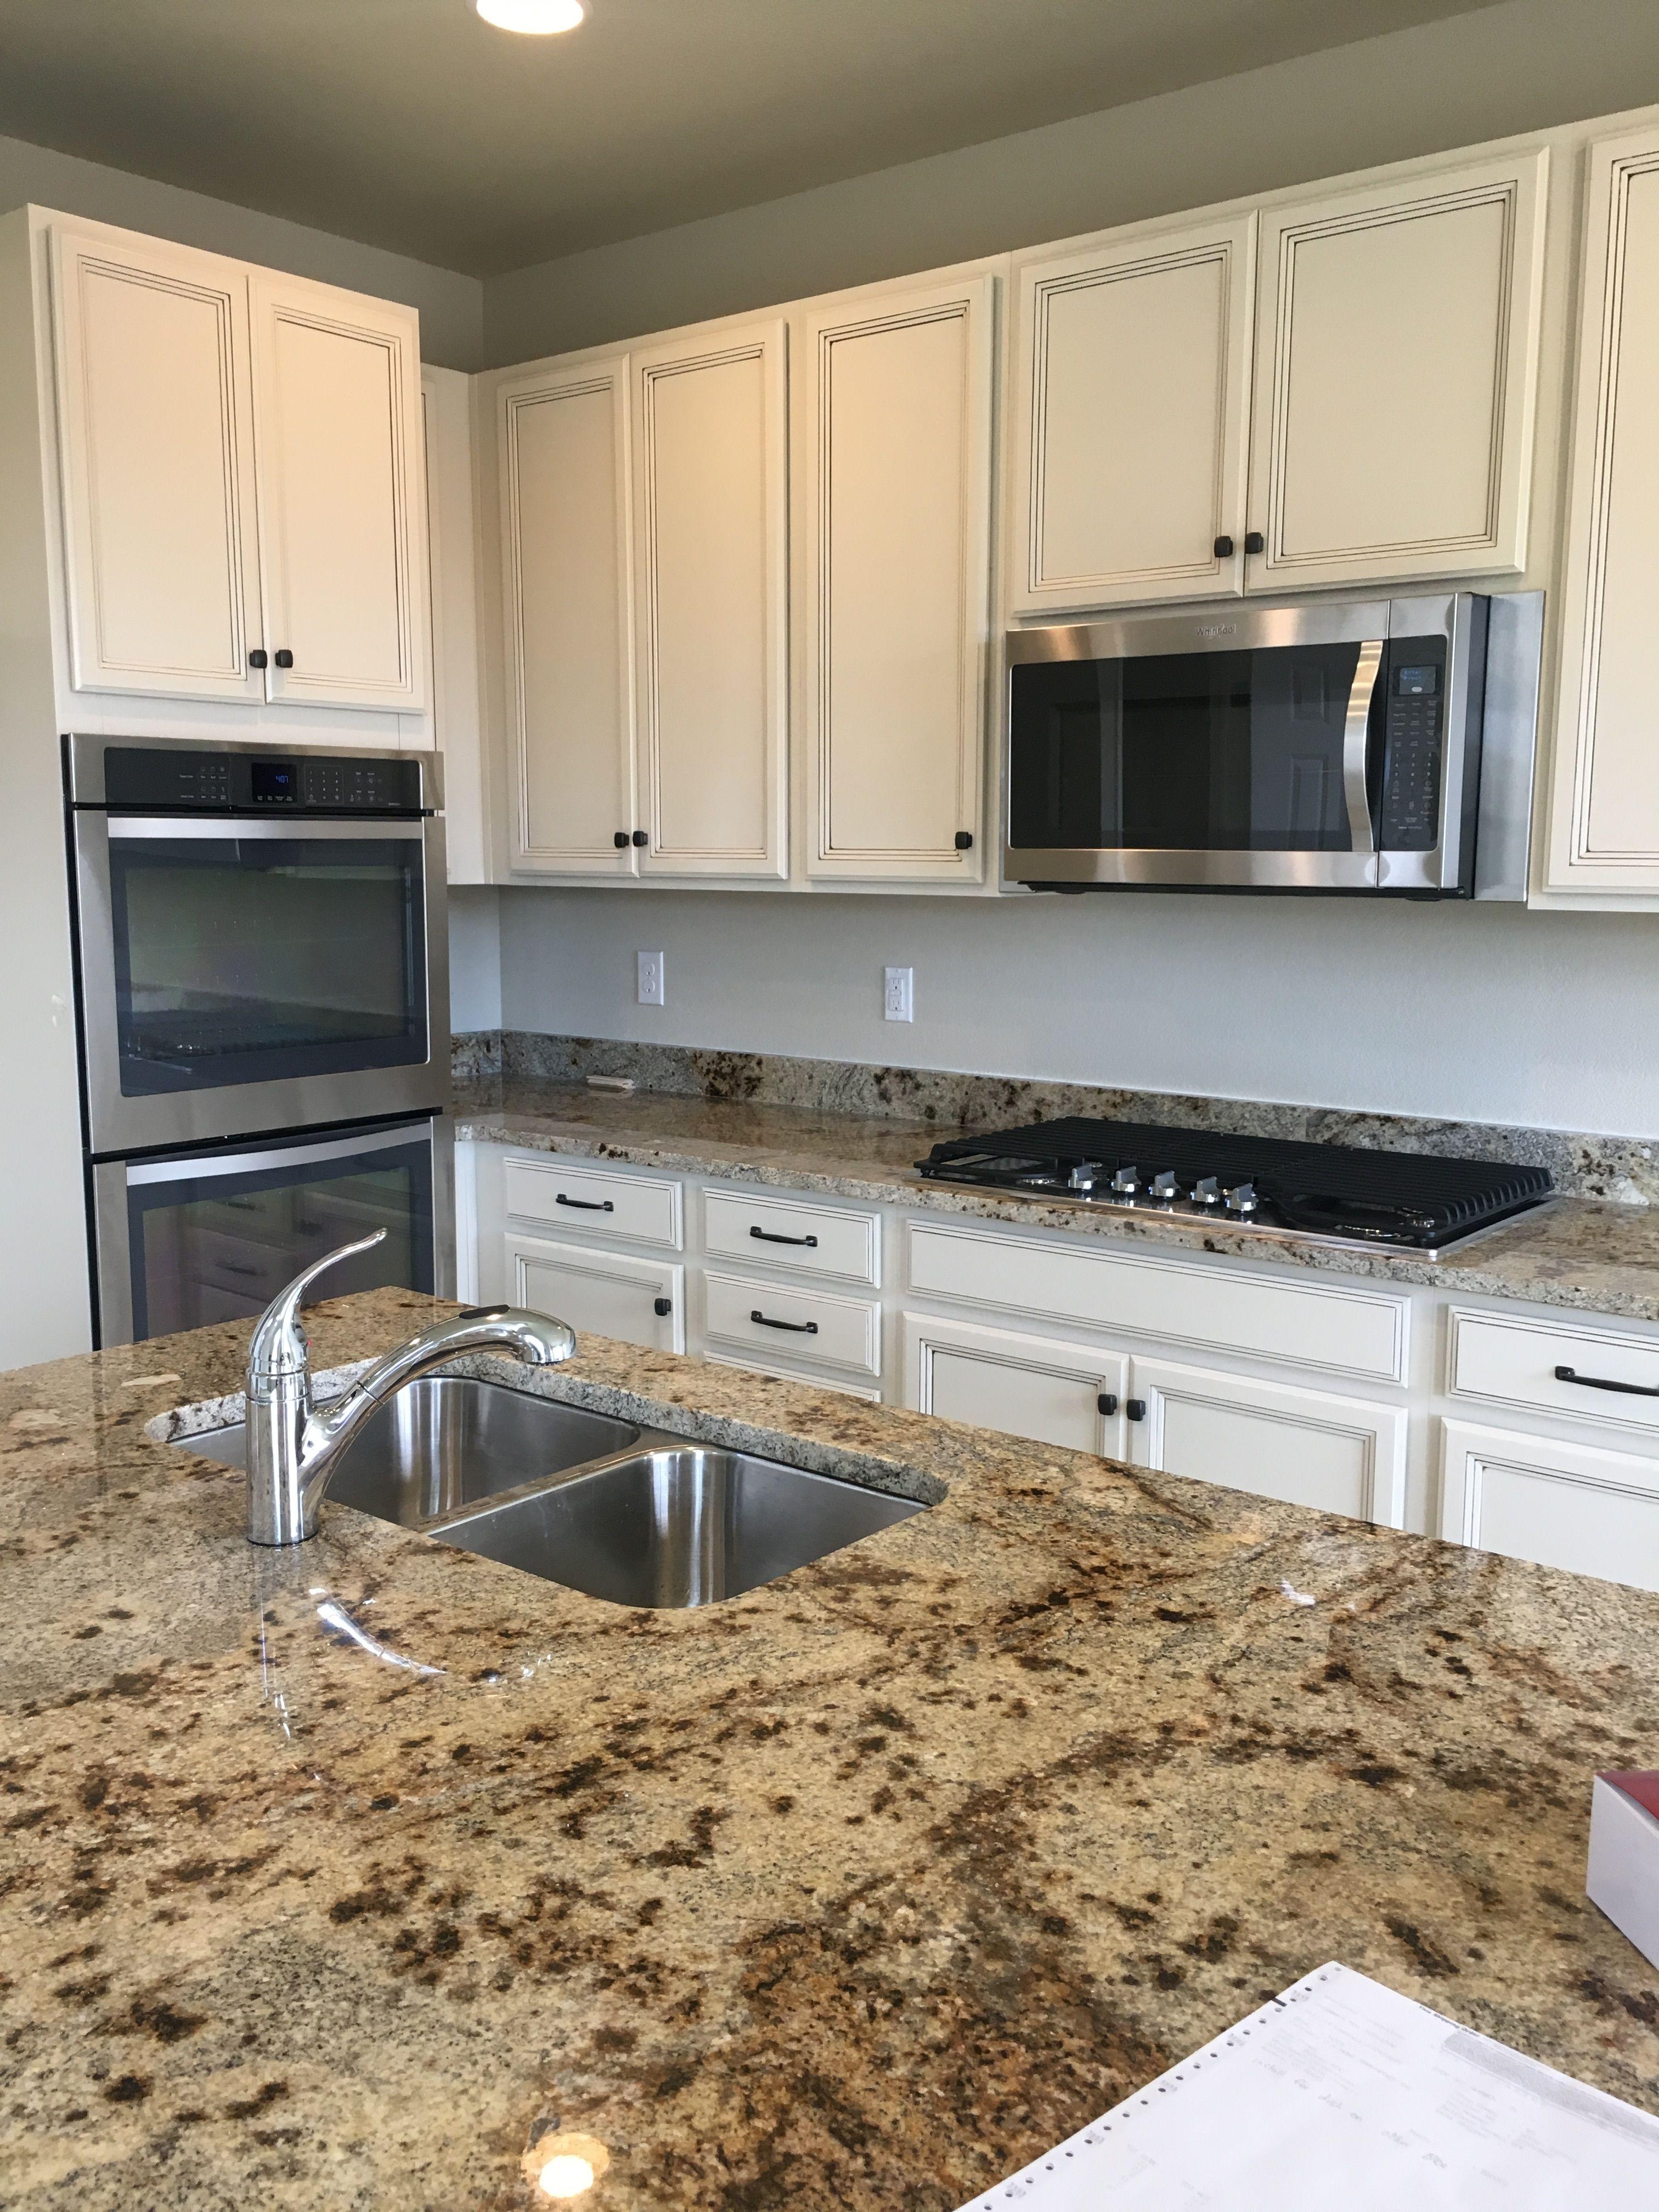 cobra granite our remodel kitchen remodel kitchen cabinets rh pinterest com